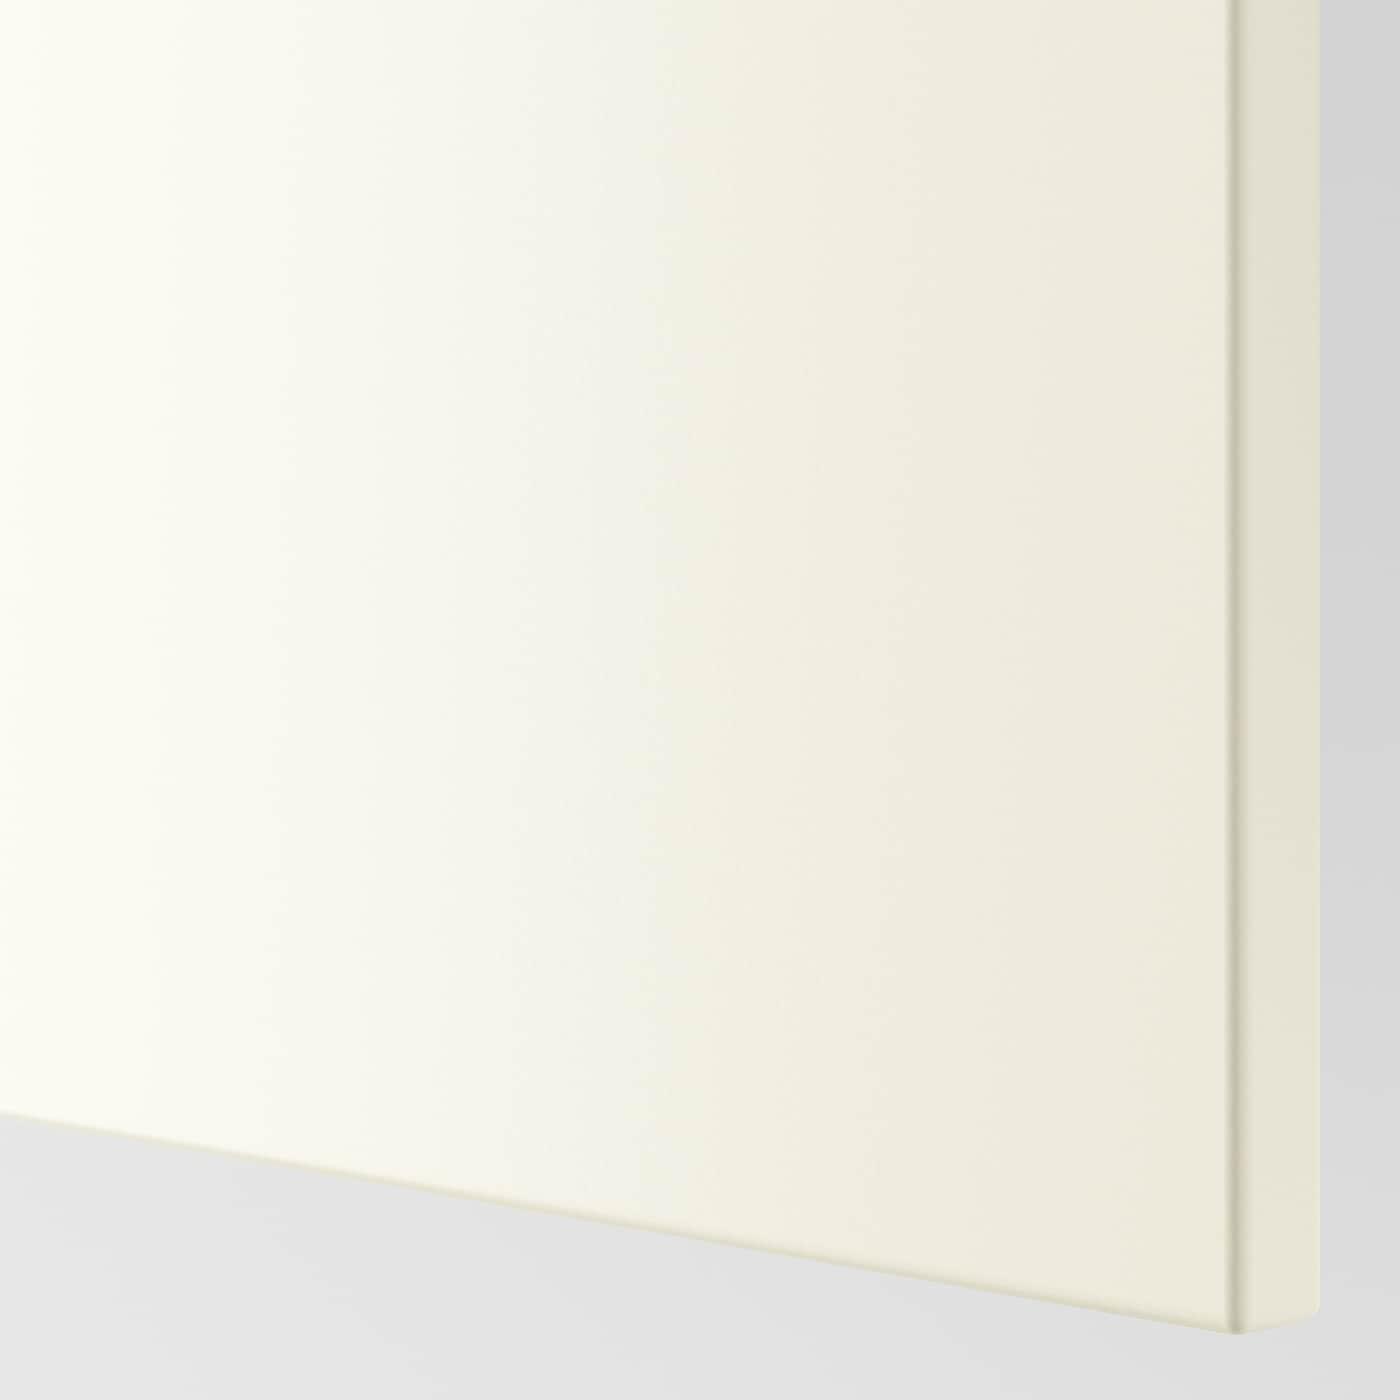 Pannelli Rivestimento Cucina Ikea fÖrbÄttra cover panel - off-white 62x80 cm